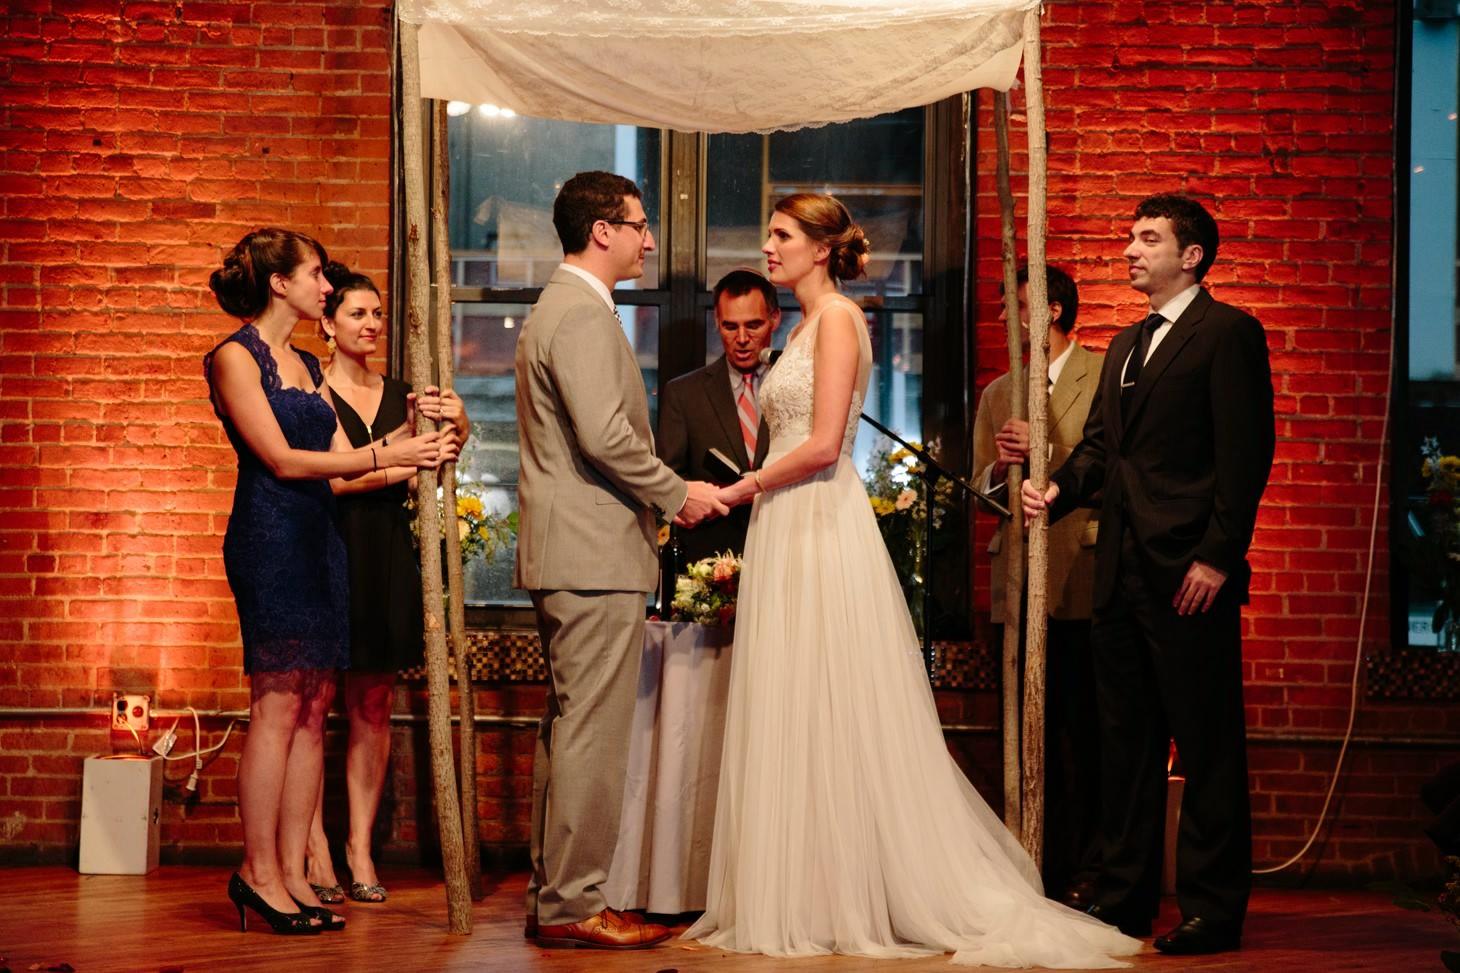 017-nyc-dumbo-loft-brooklyn-wedding-photographer-smitten-chickens-photo-.jpg